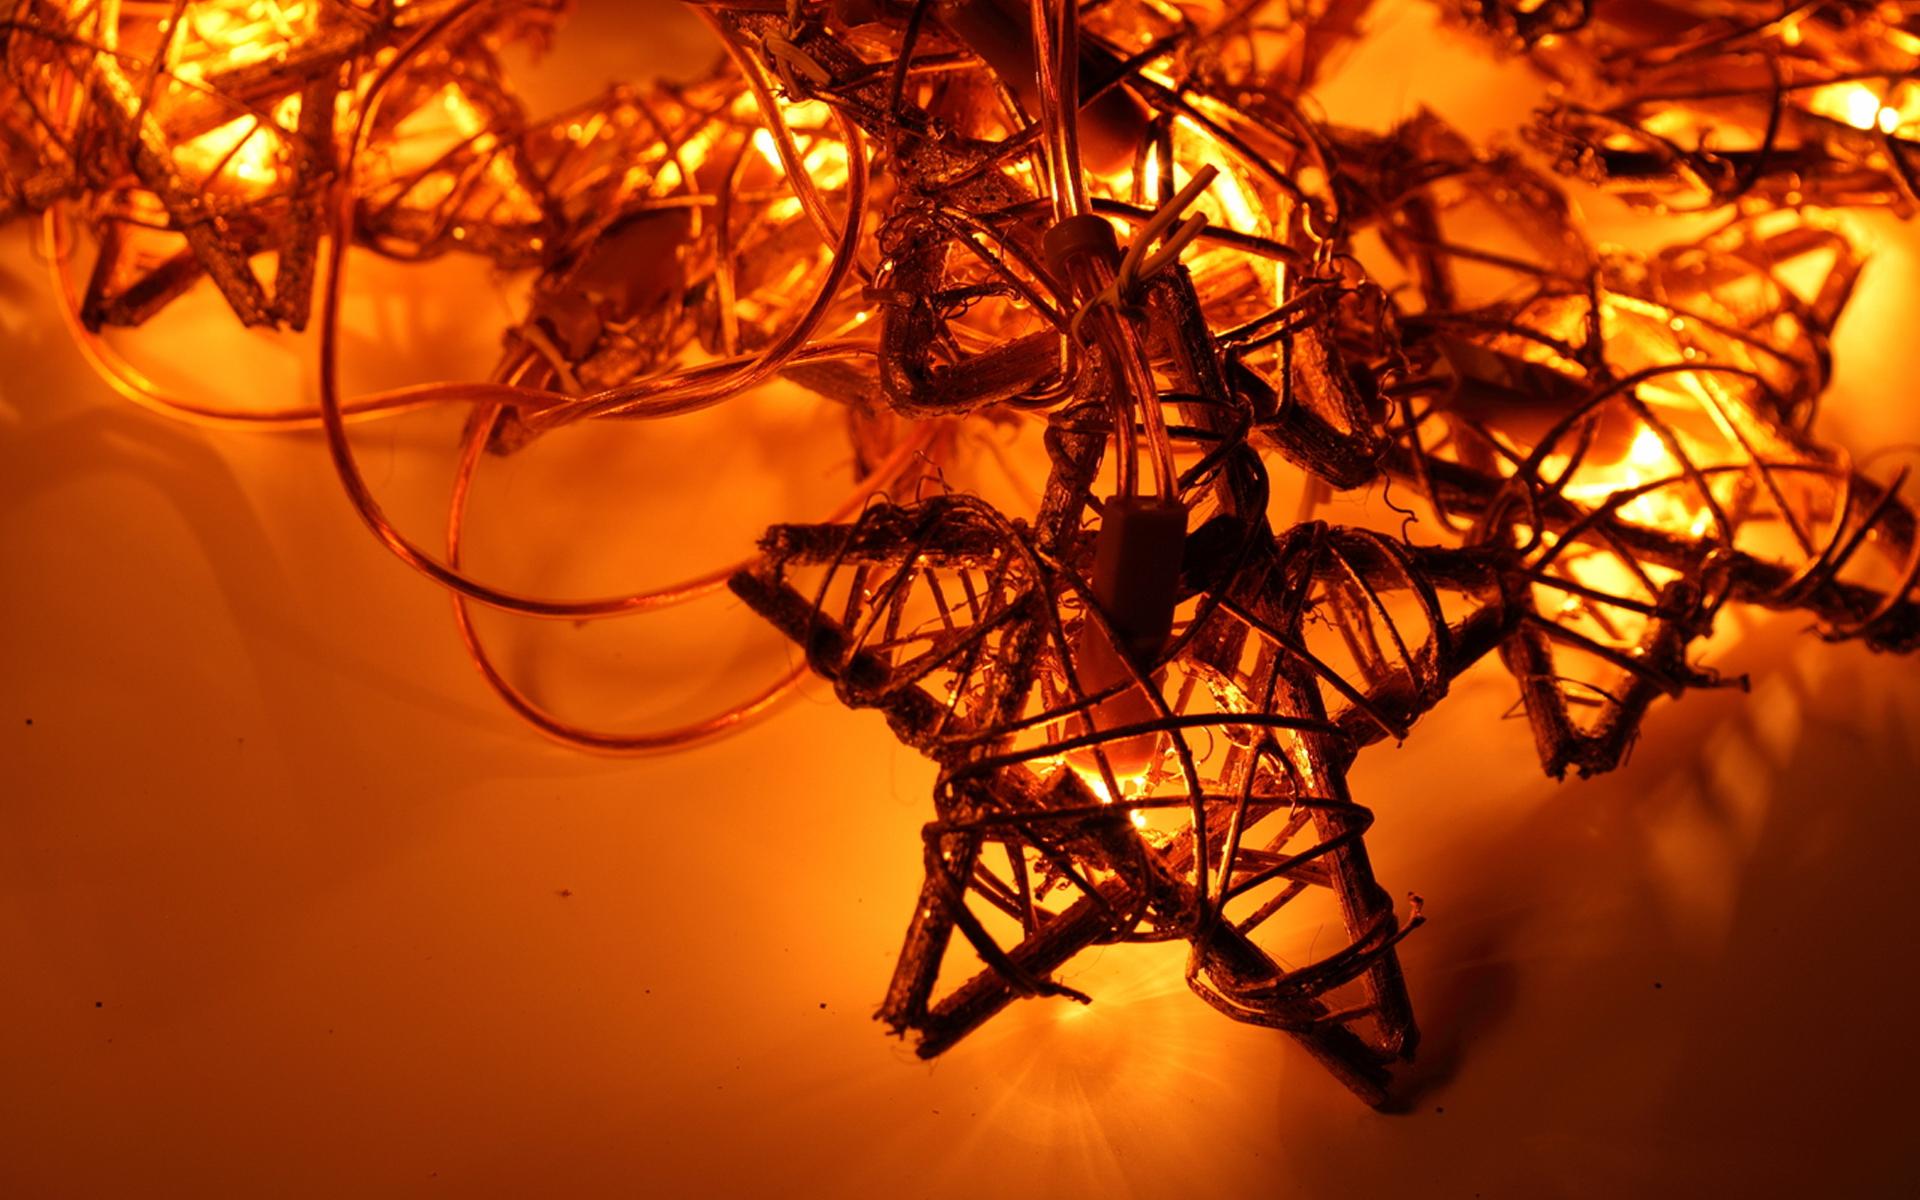 beautiful christmas garland wallpapers and images wallpapers pictures photos - Beautiful Christmas Photos